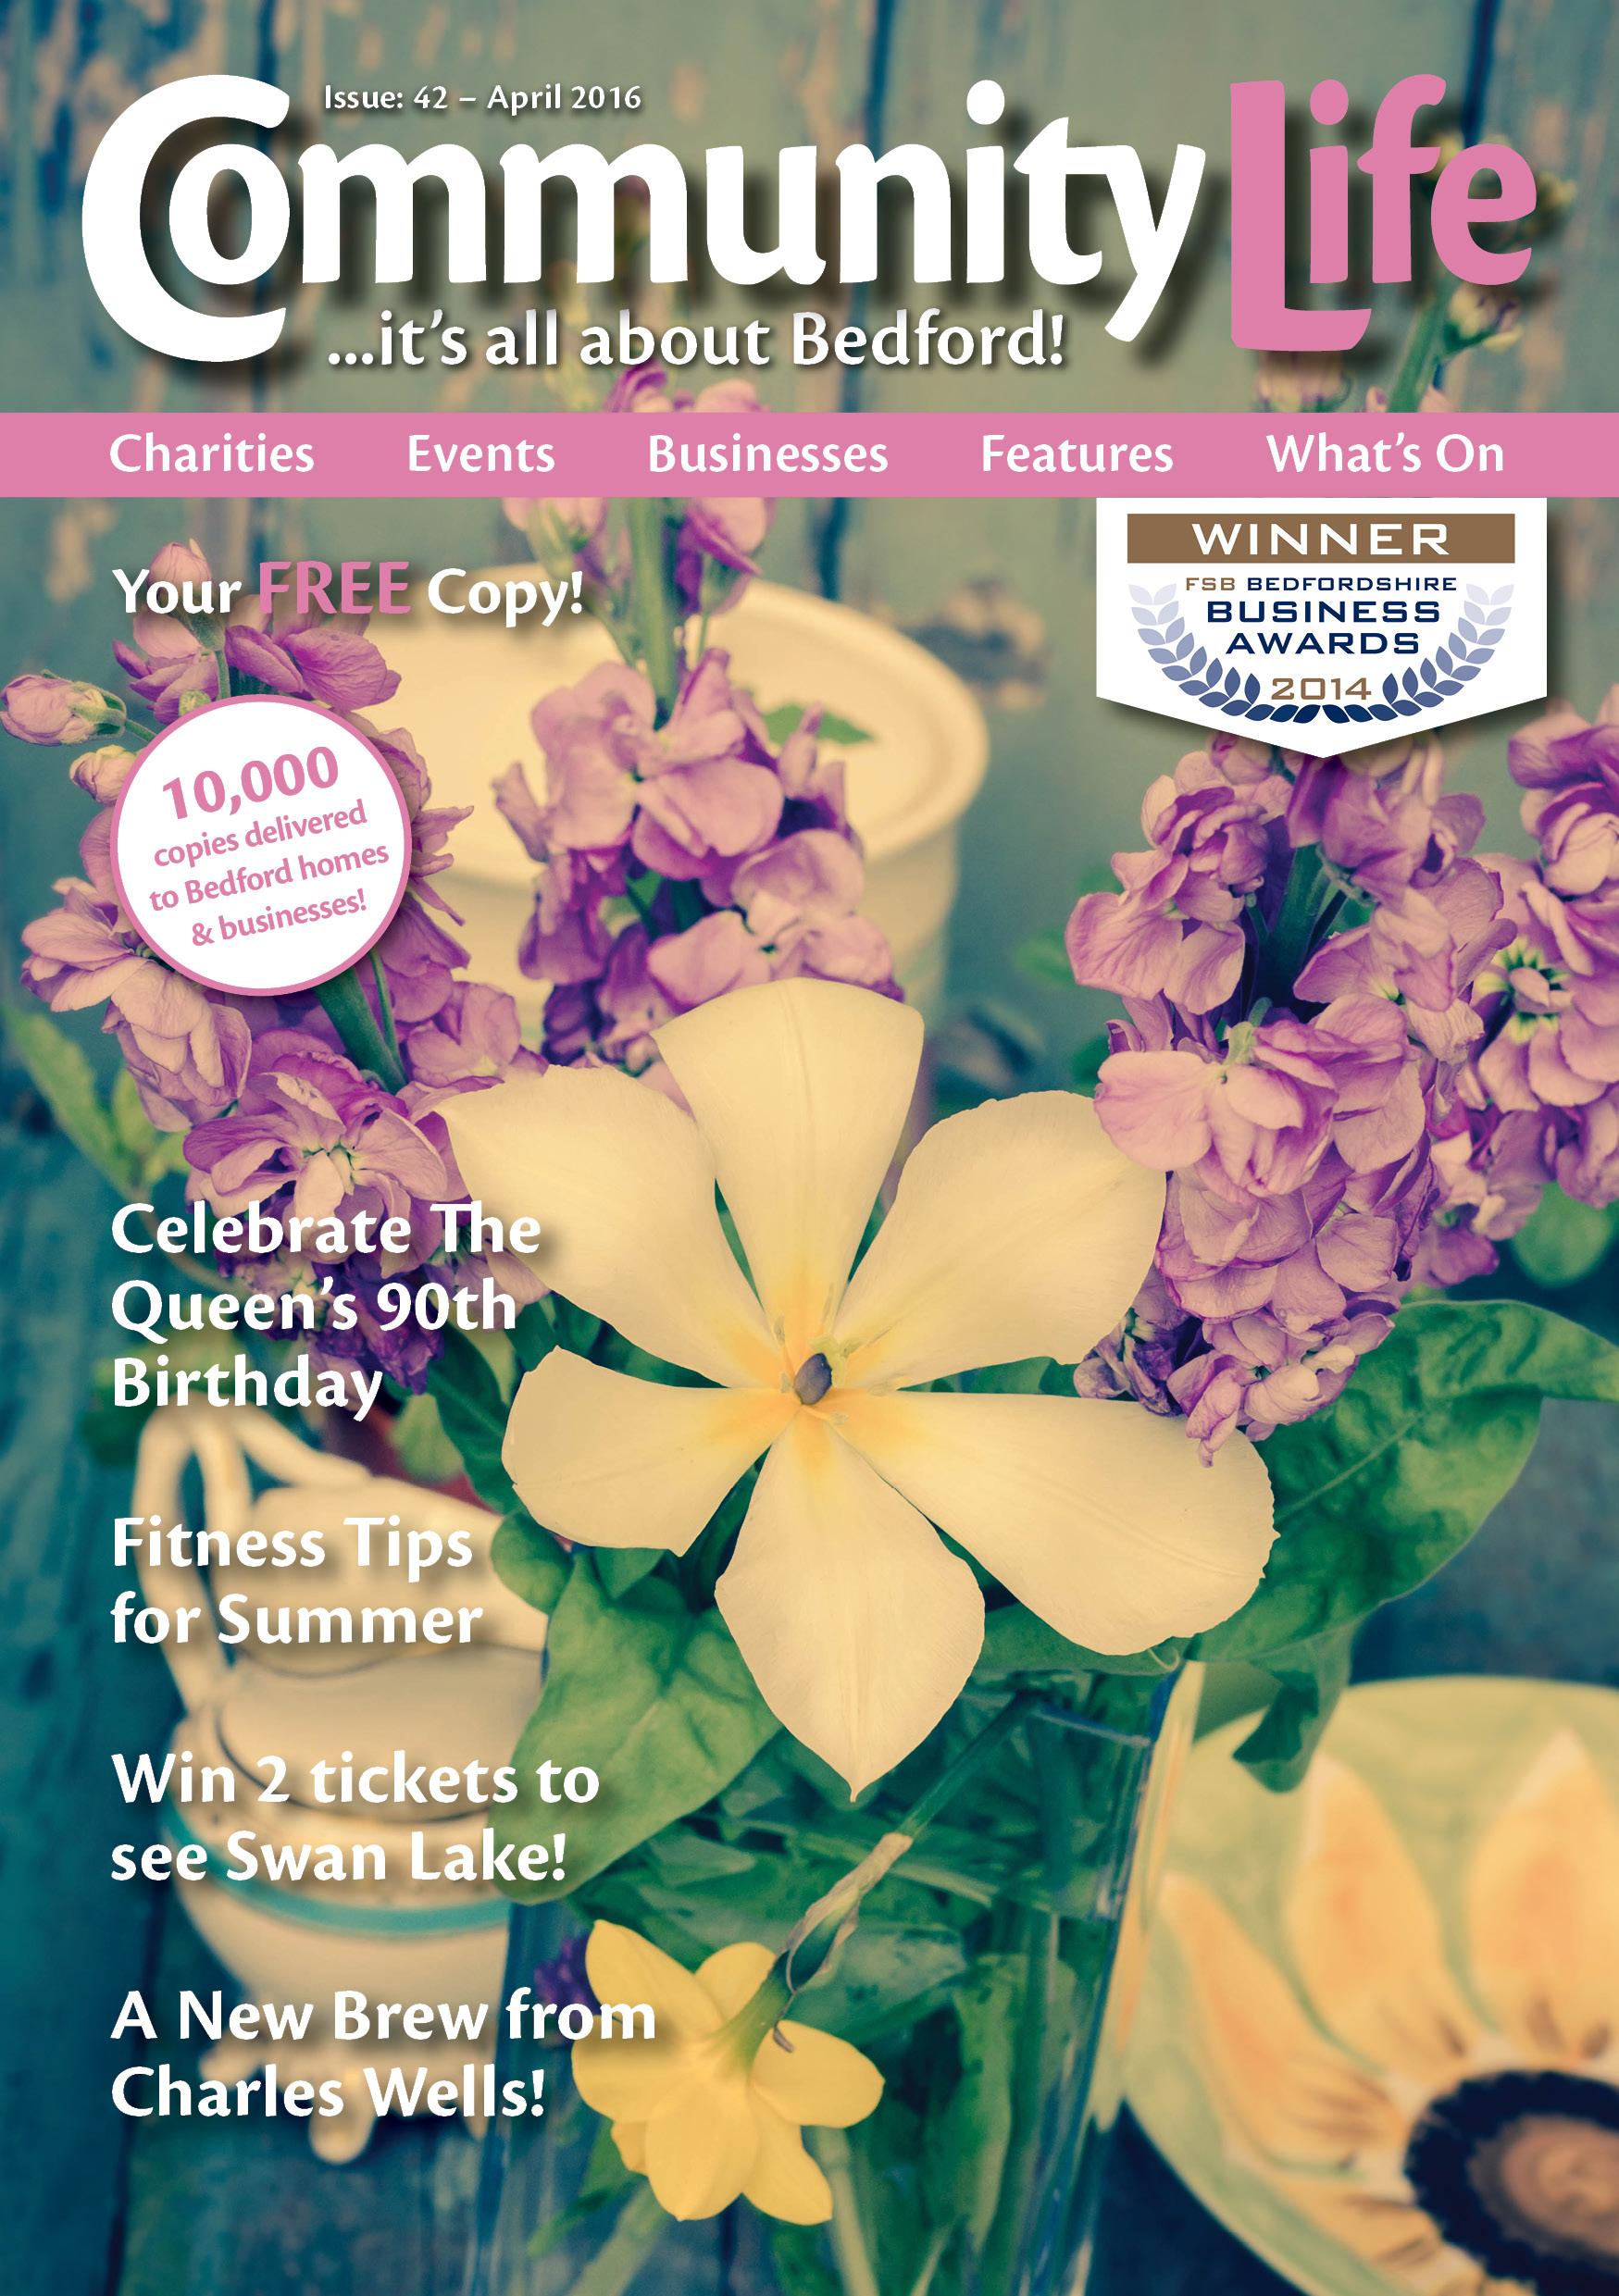 Community-Life-April-edition